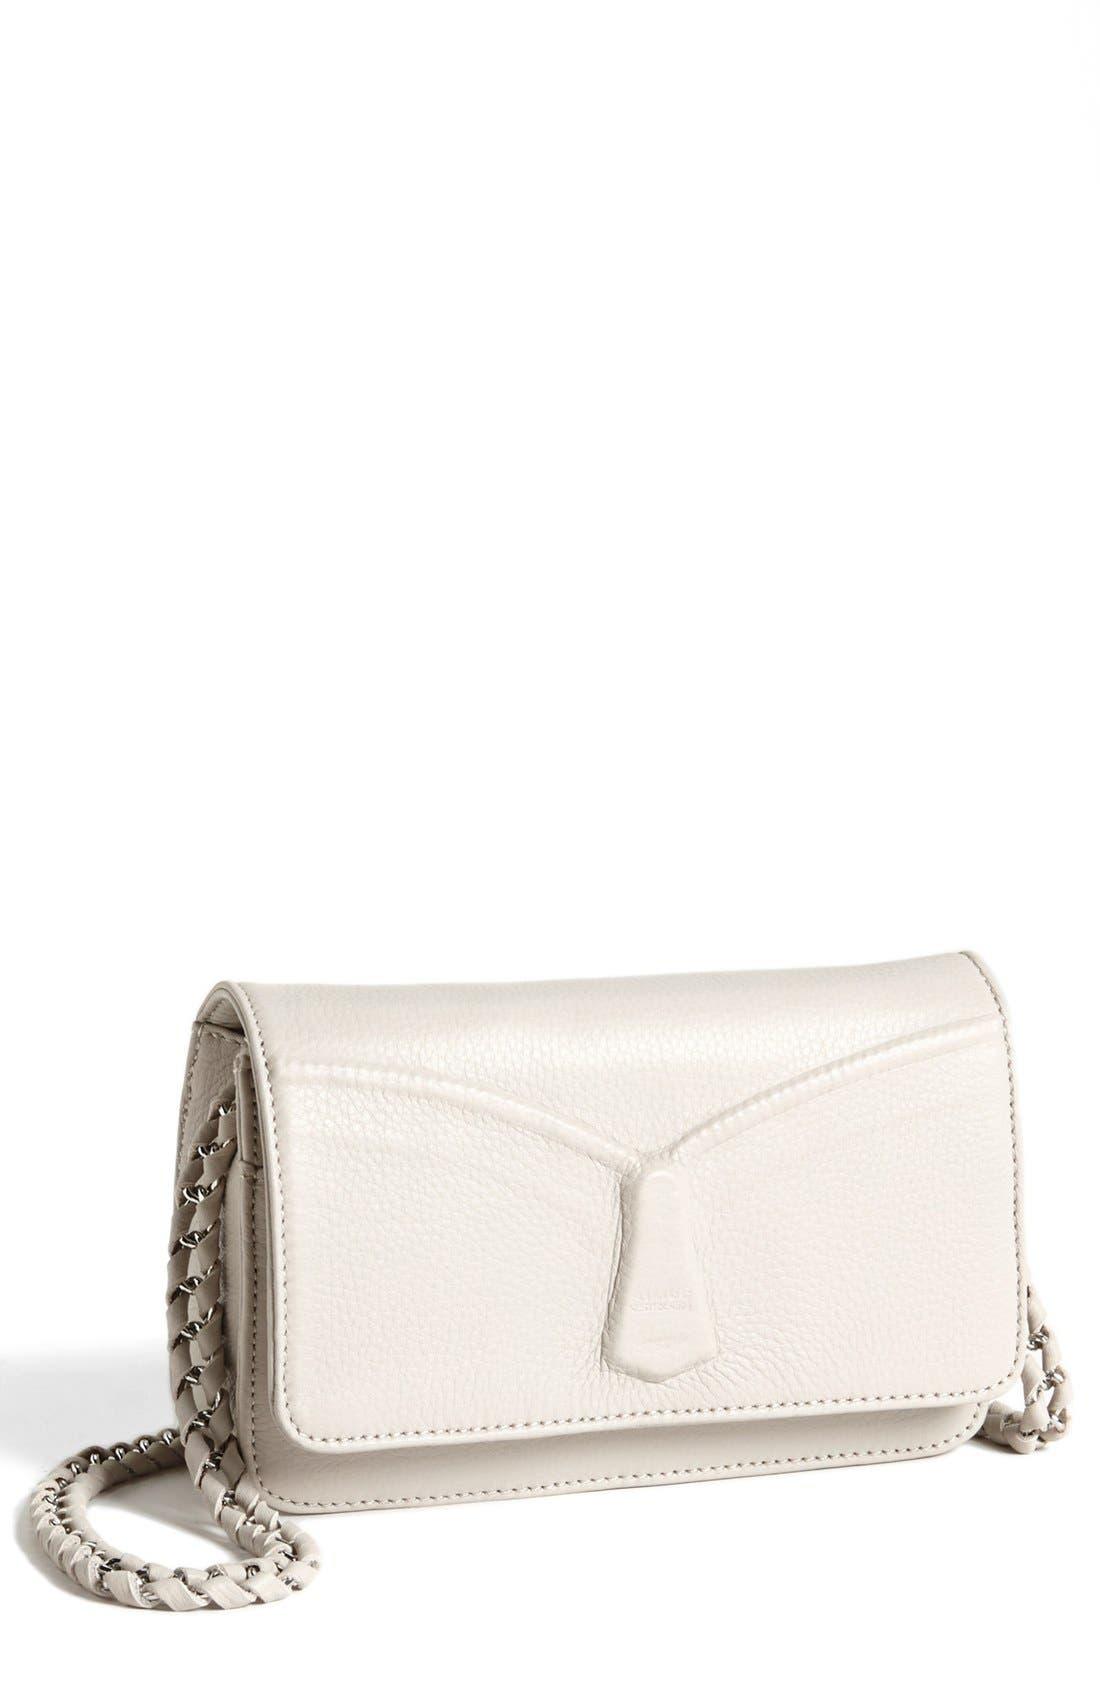 Alternate Image 1 Selected - Aimee Kestenberg 'Kiera' Crossbody Bag